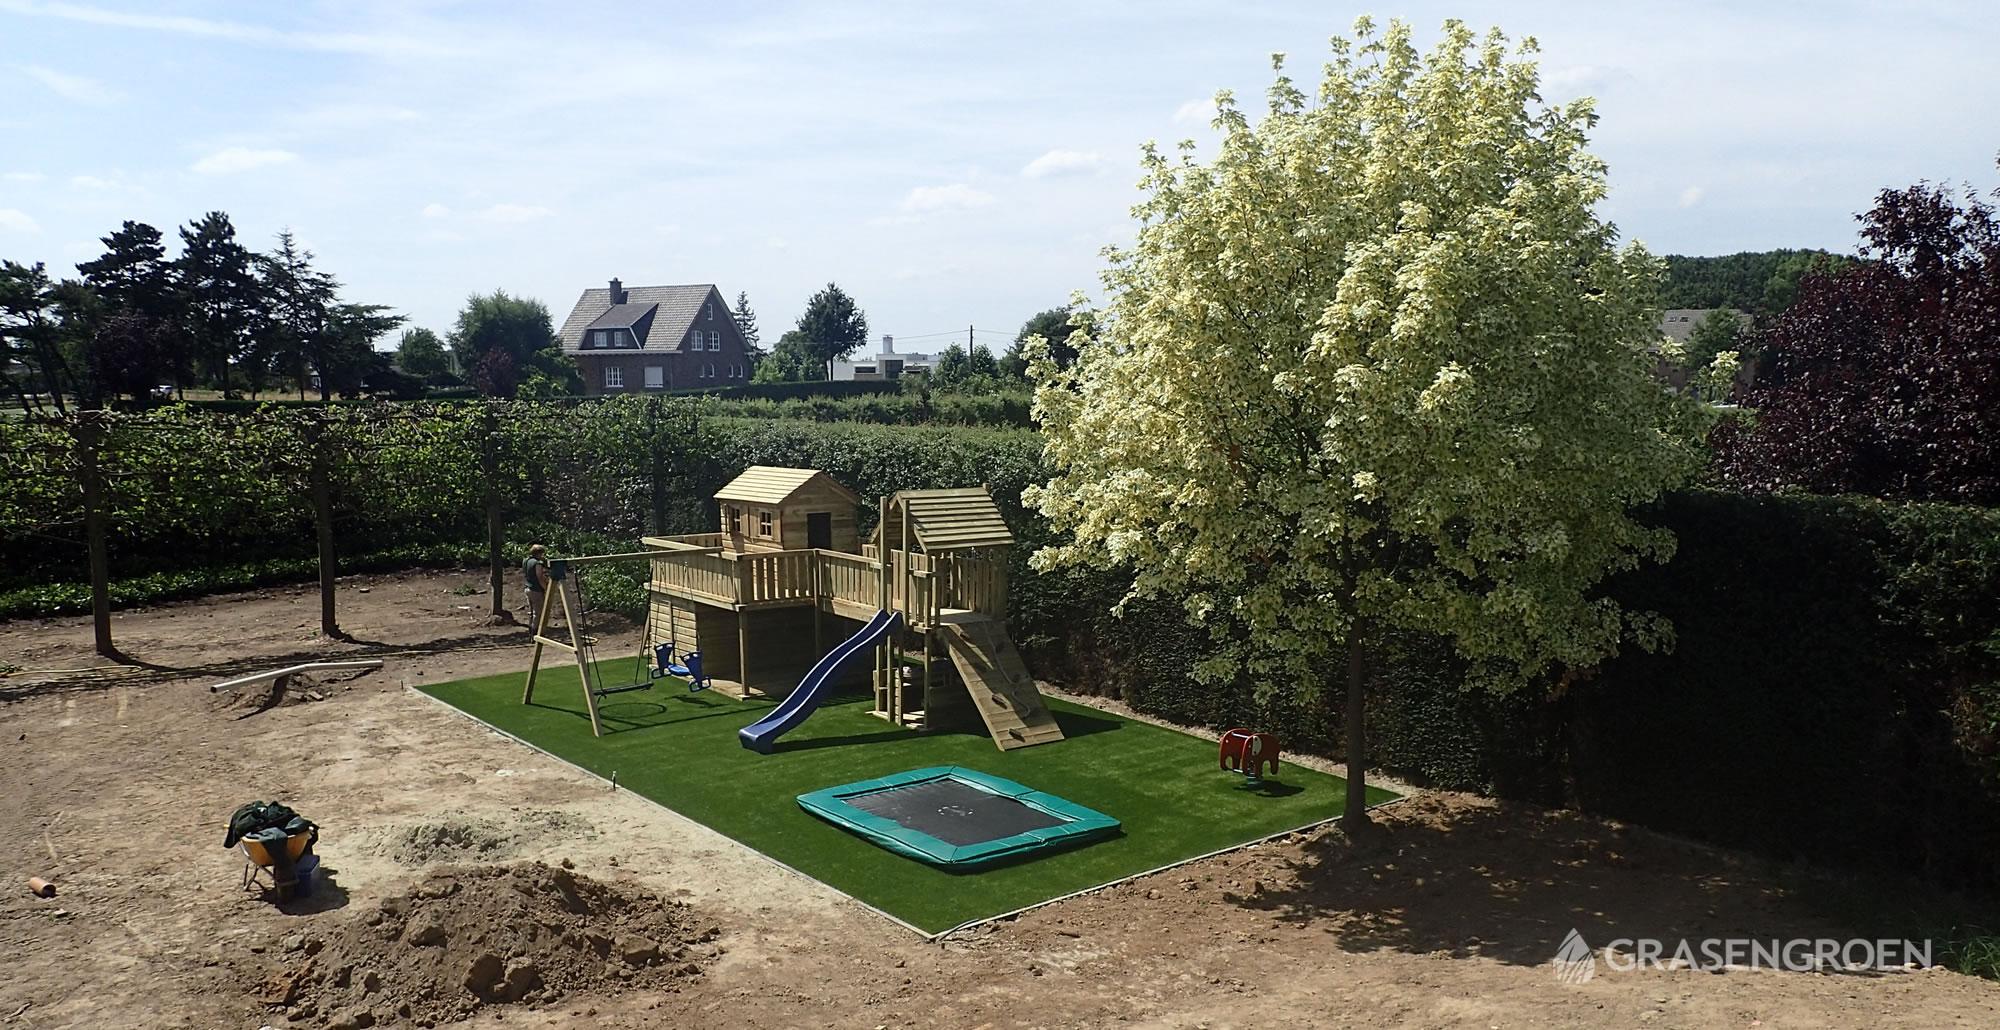 Kunstgrasleggenmaaseik18 • Gras en Groen Kunstgras